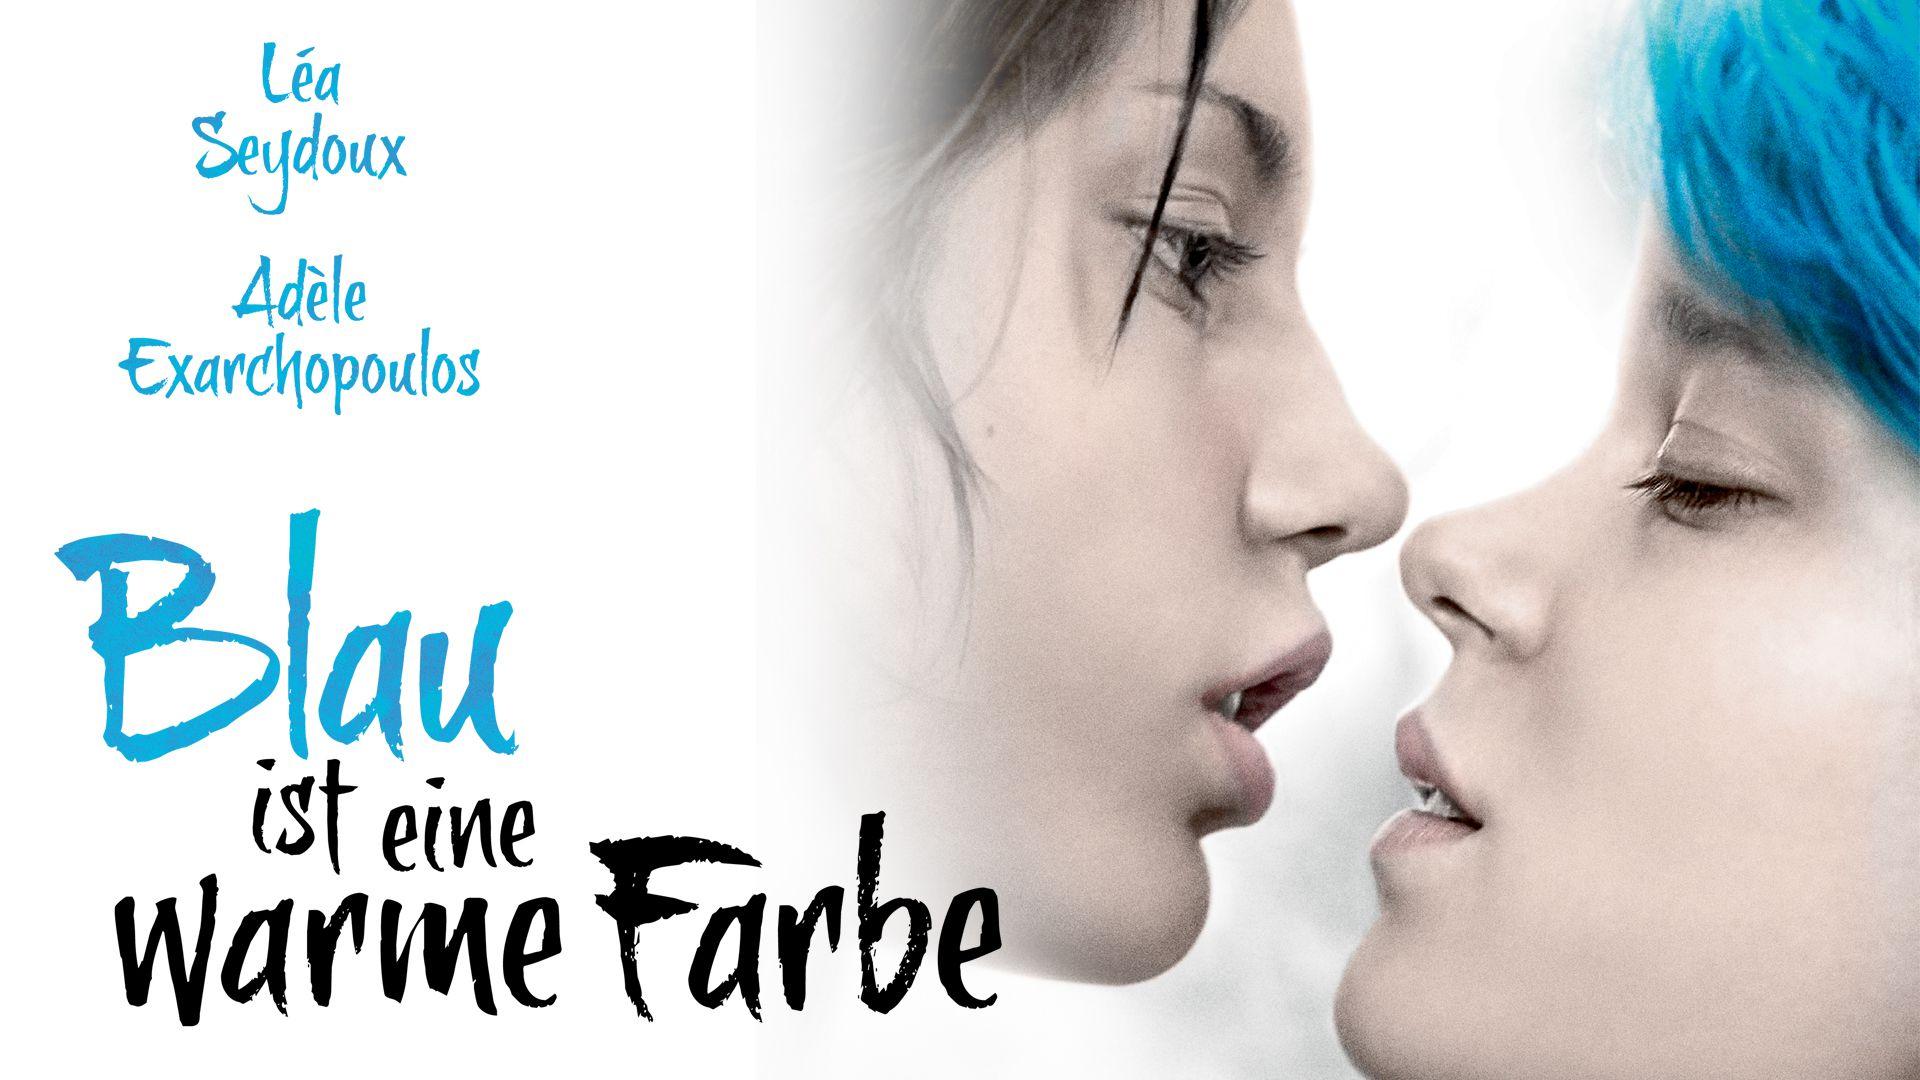 Blau Ist Eine Warme Farbe La Vie D Adele F B E 2013 Streams Tv Termine News Dvds Tv Wunschliste